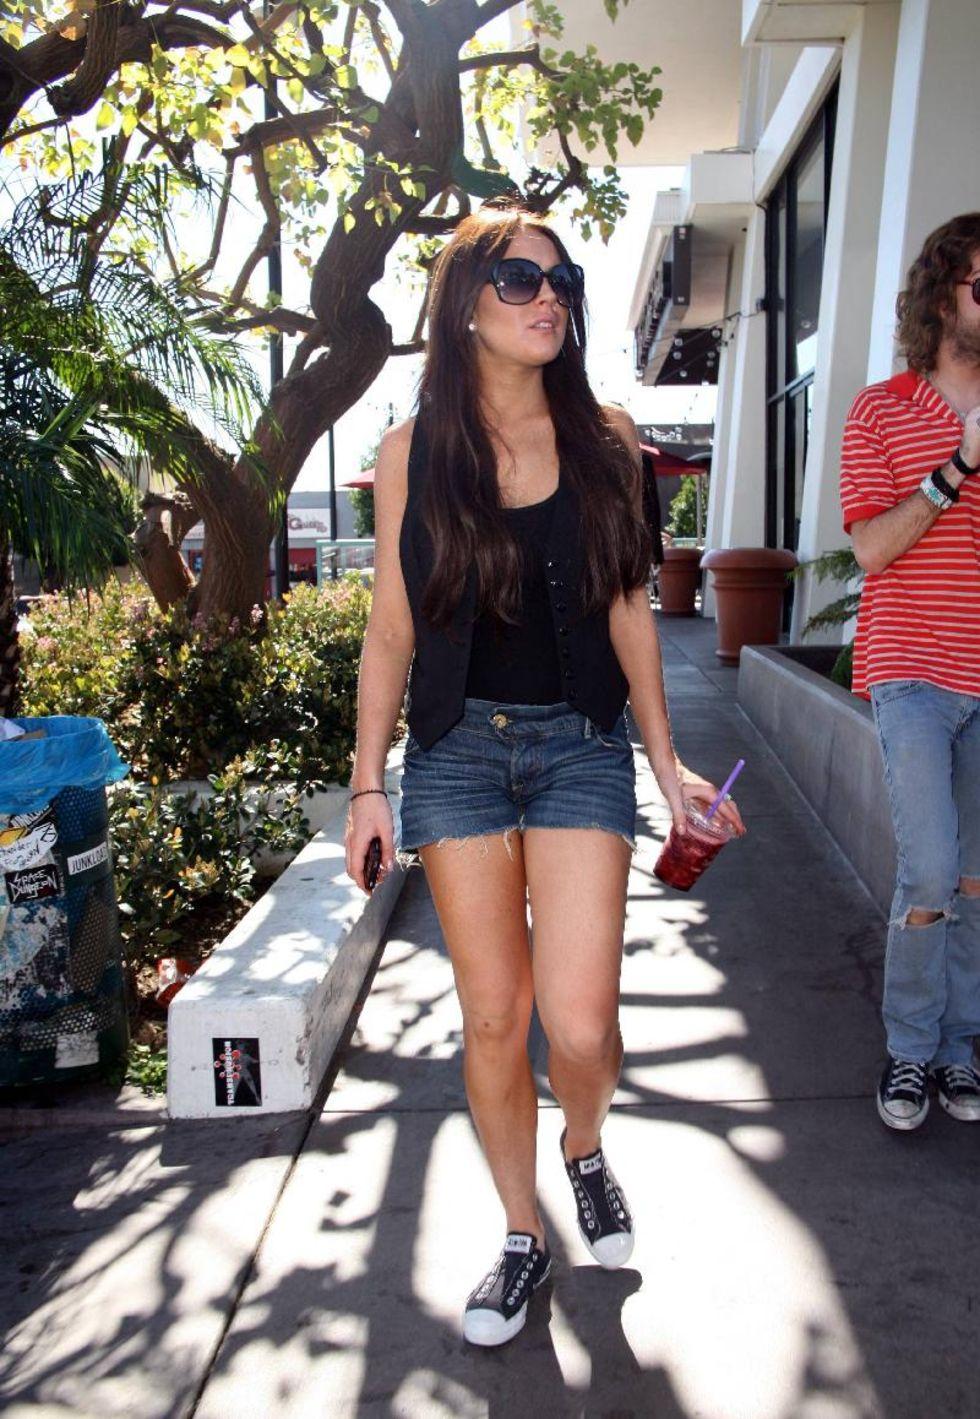 lindsay-lohan-denim-shorts-candids-in-los-angeles-06